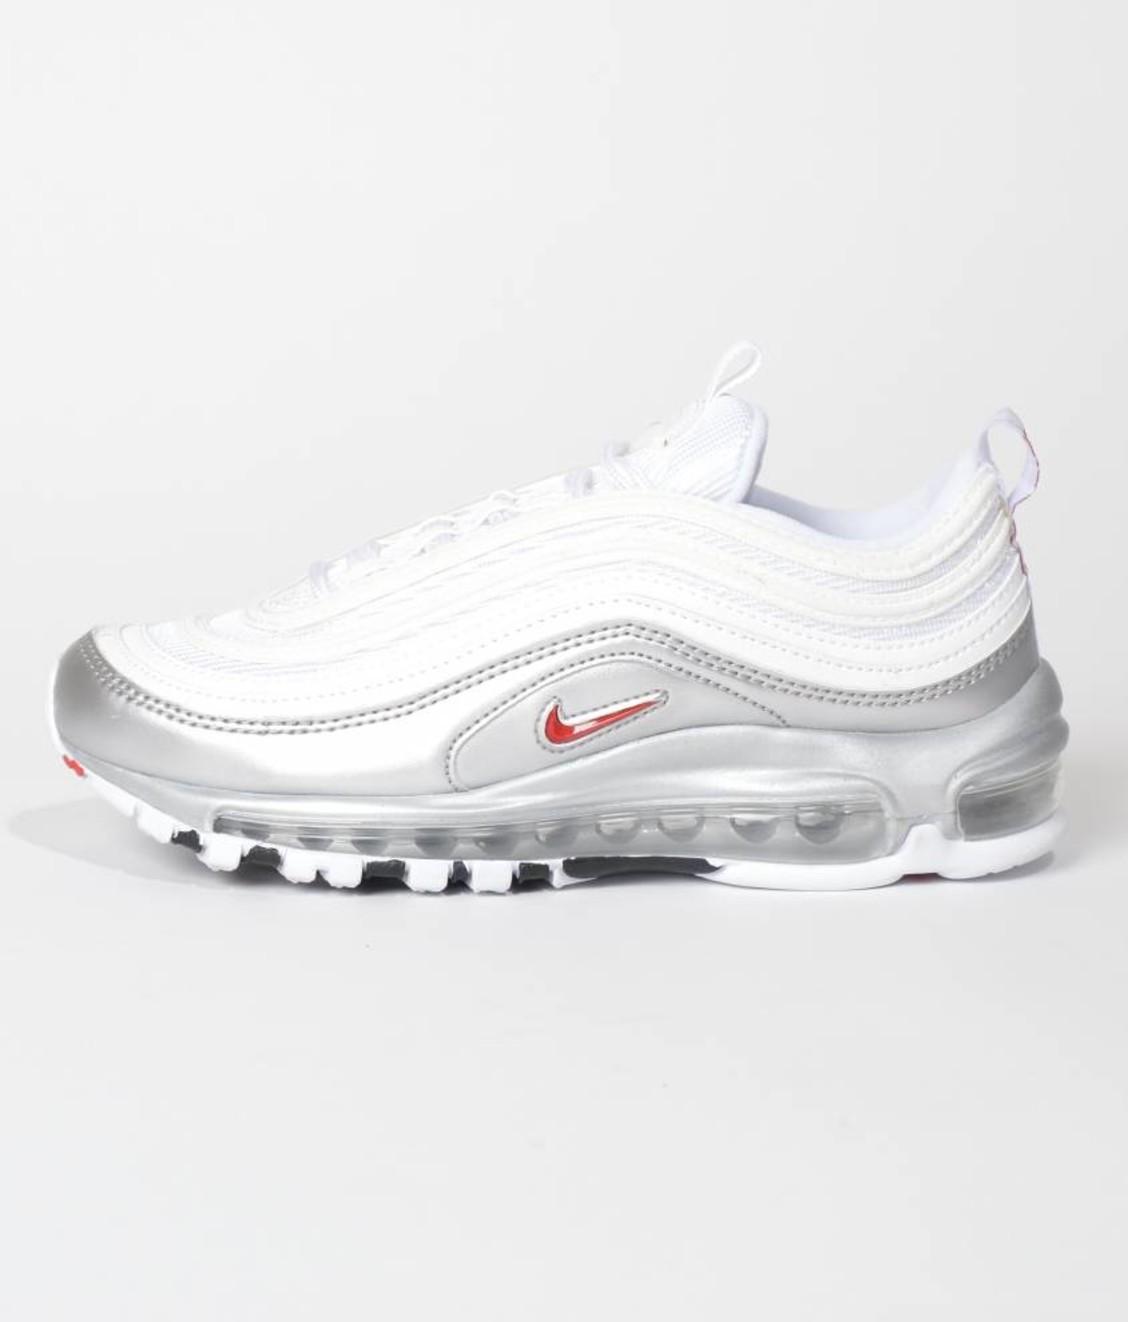 quality design 3ded8 e53fe Nike Nike Air Max 97 QS White Varsity Red Metallic Silver